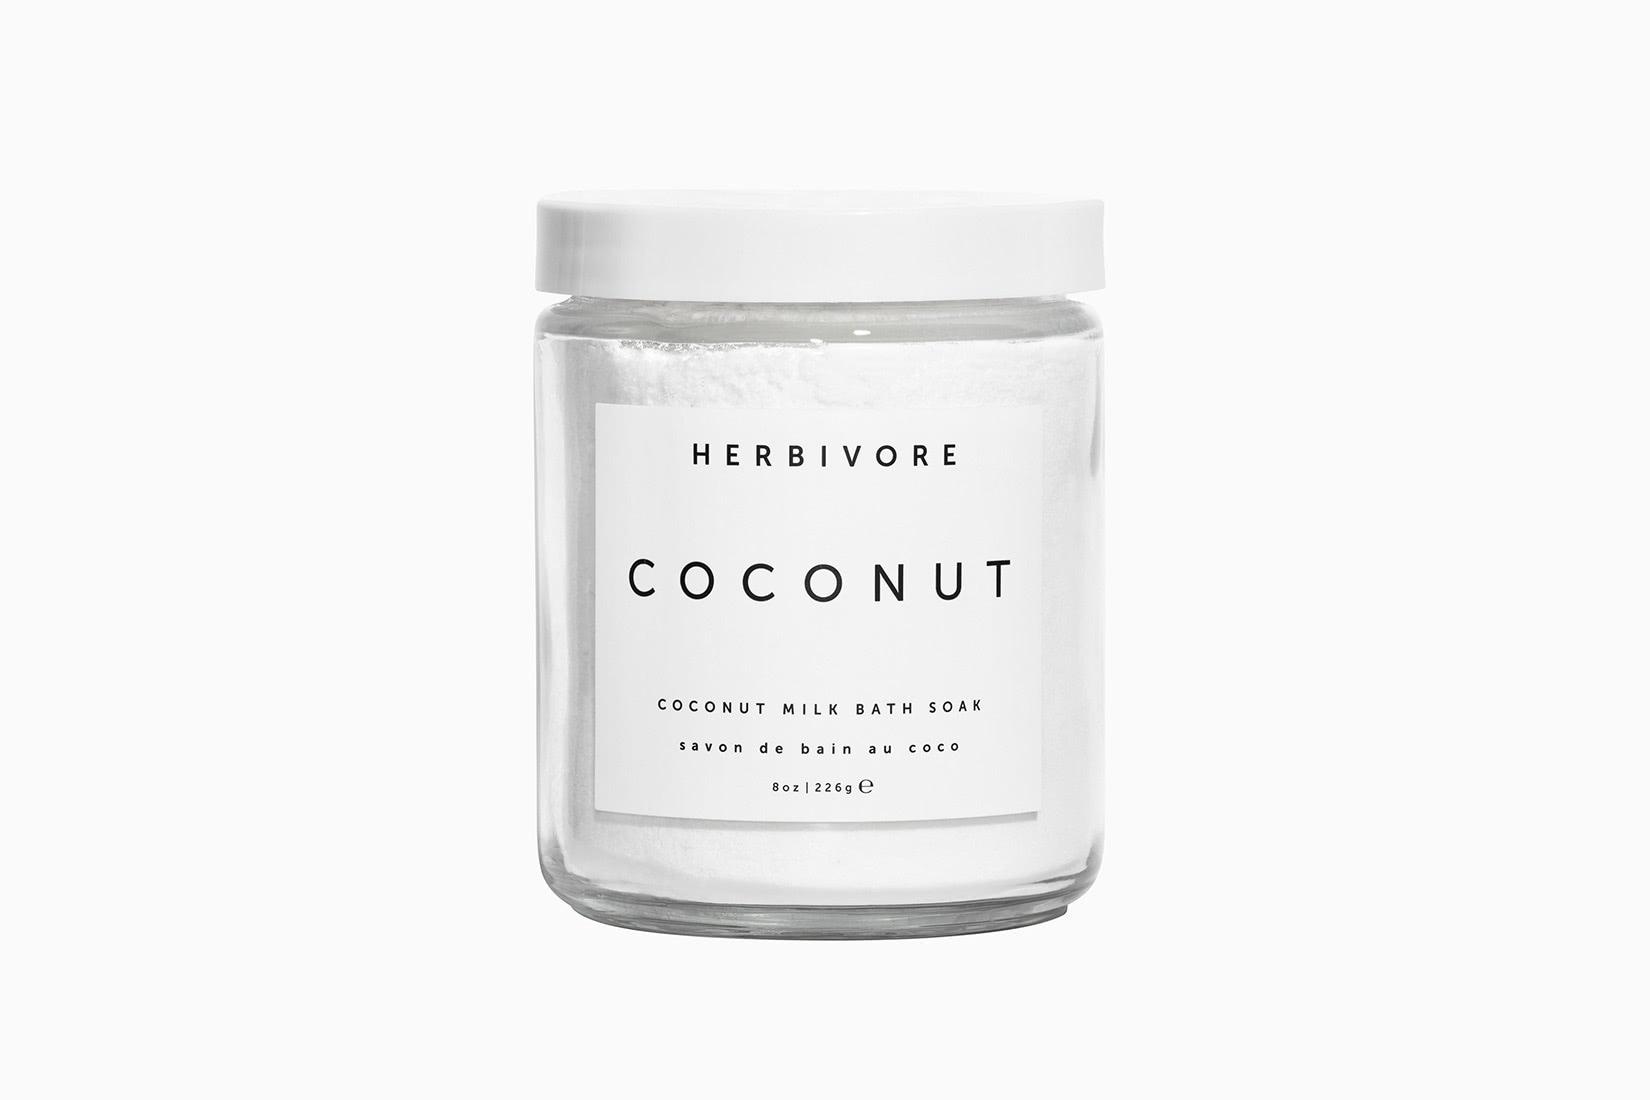 best natural organic beauty skincare herbivore botanicals coconut milk bath soak - Luxe Digital